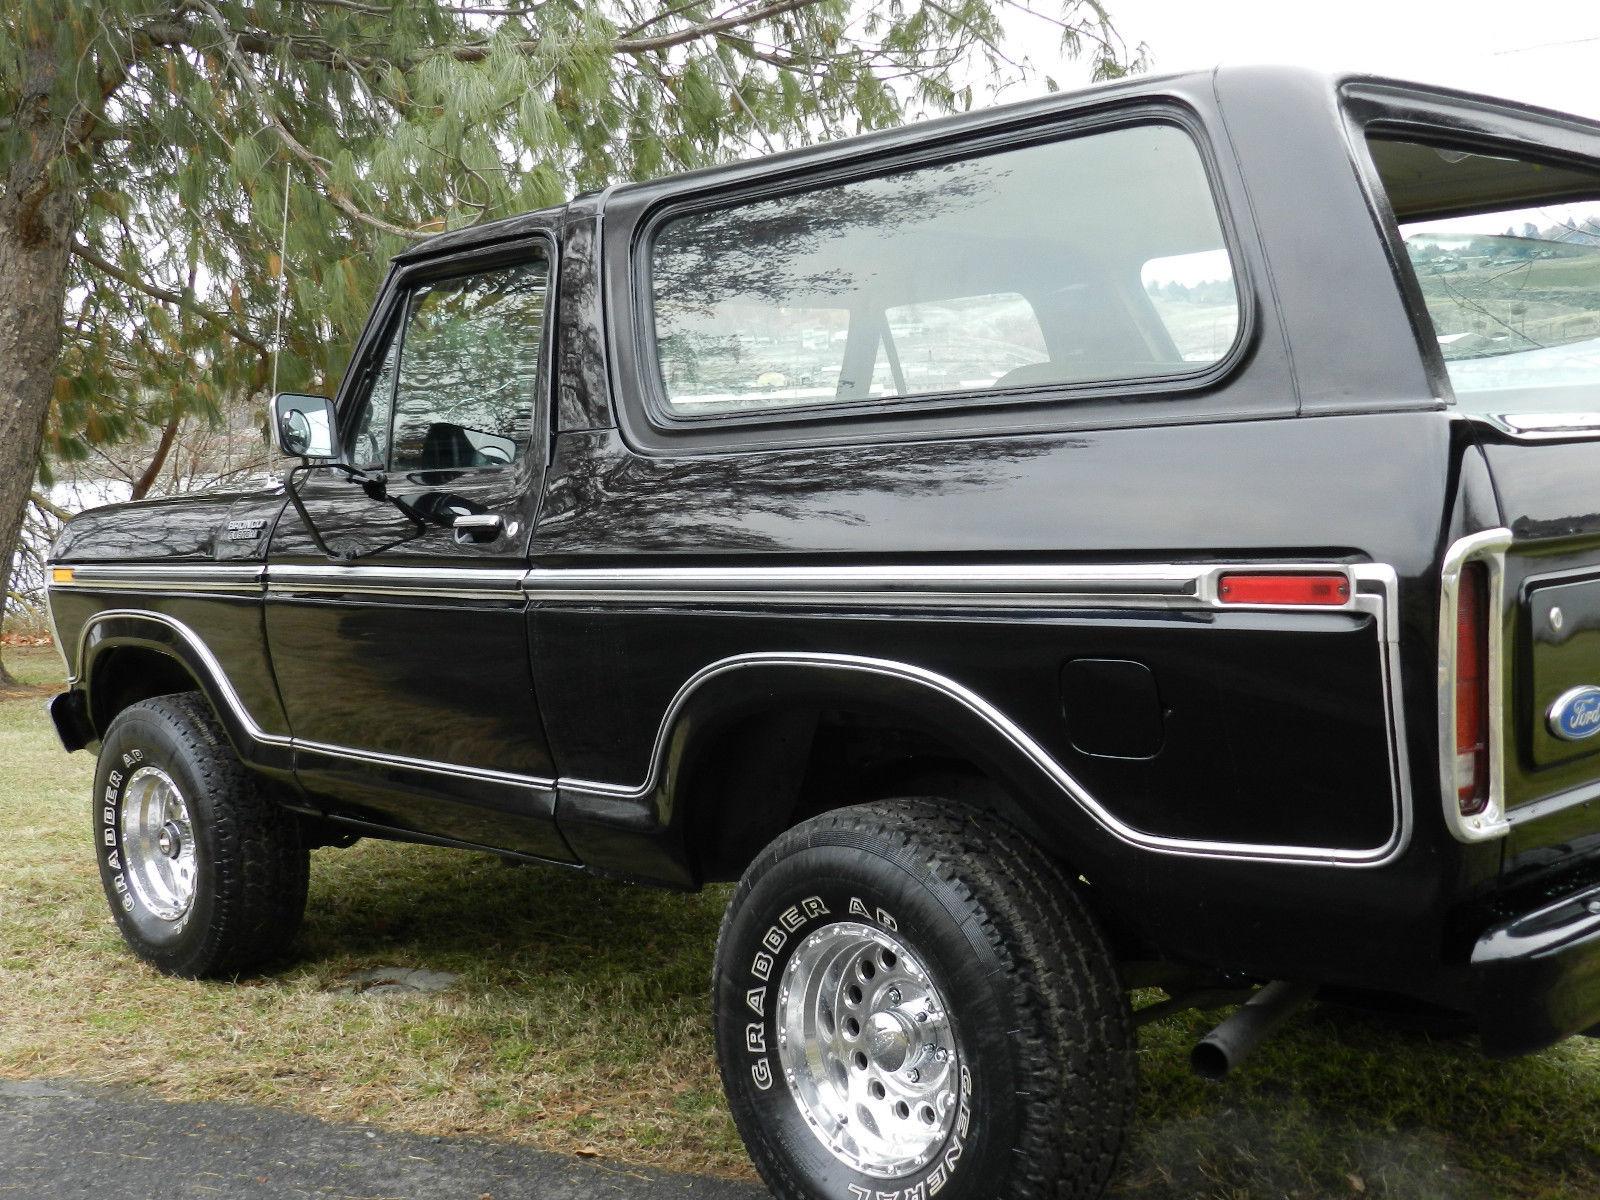 ford f150 bronco 2002 mazda protege5 engine diagram 1979 4x4 xlt black on classic solid